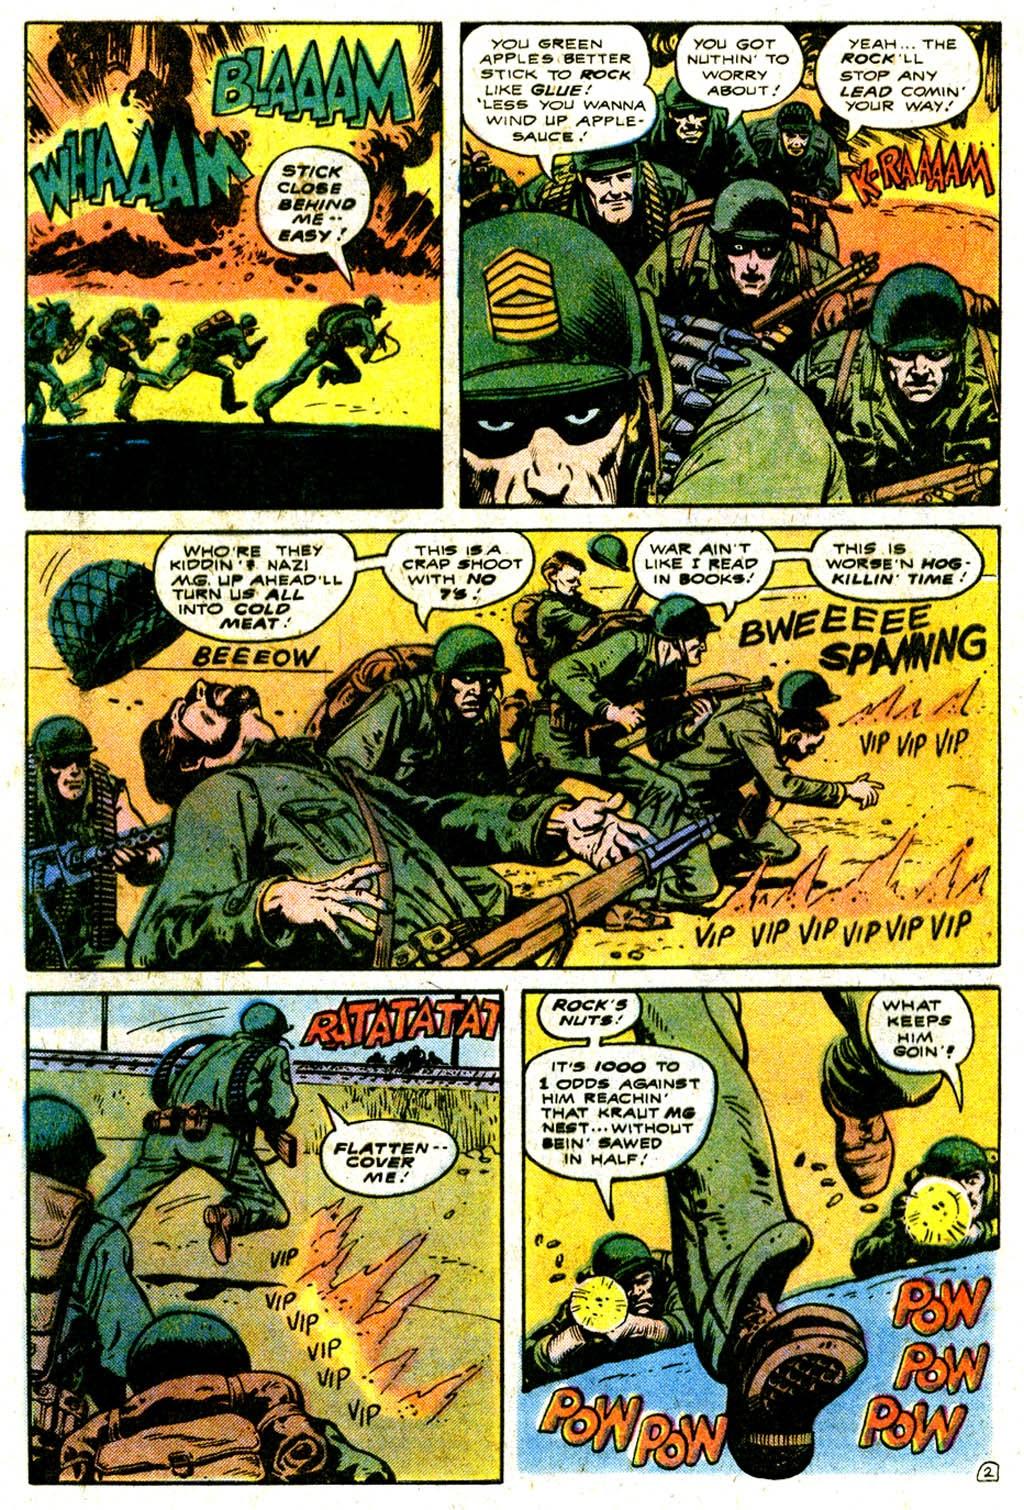 Read online Sgt. Rock comic -  Issue #316 - 4